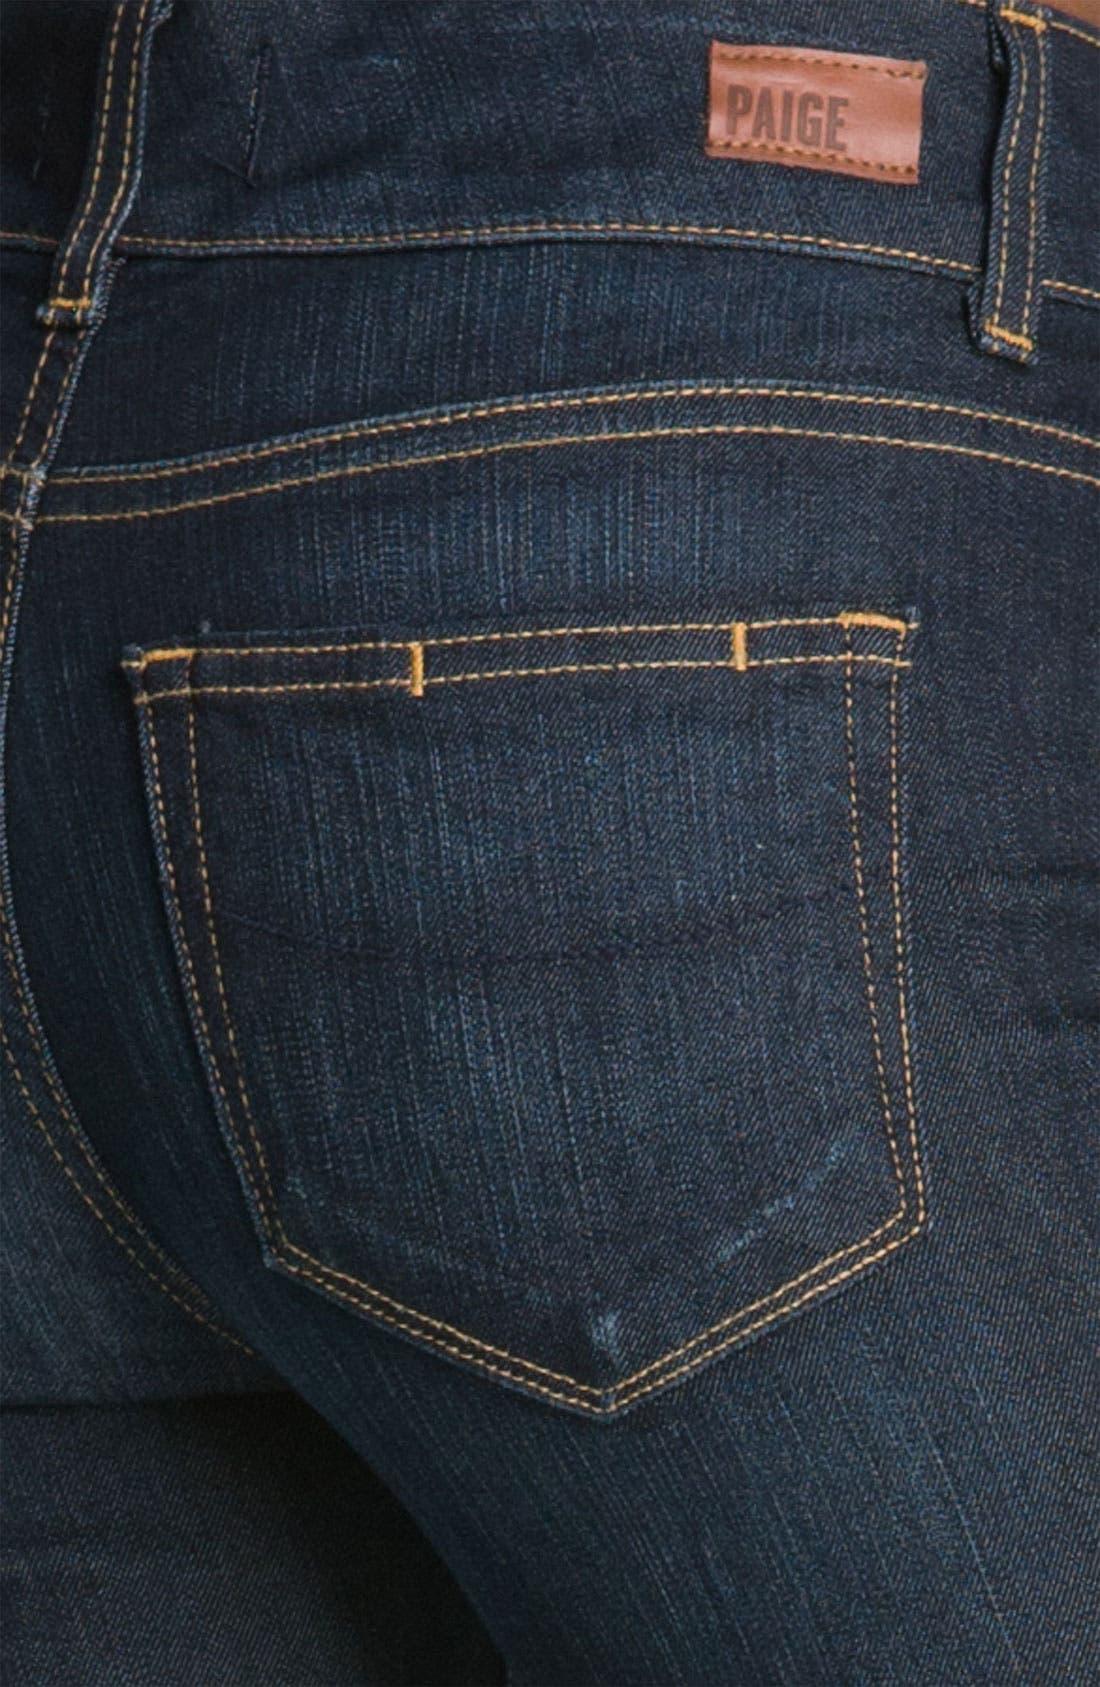 Alternate Image 3  - PAIGE 'Hidden Hills' High Rise Bootcut Stretch Jeans (Stream)